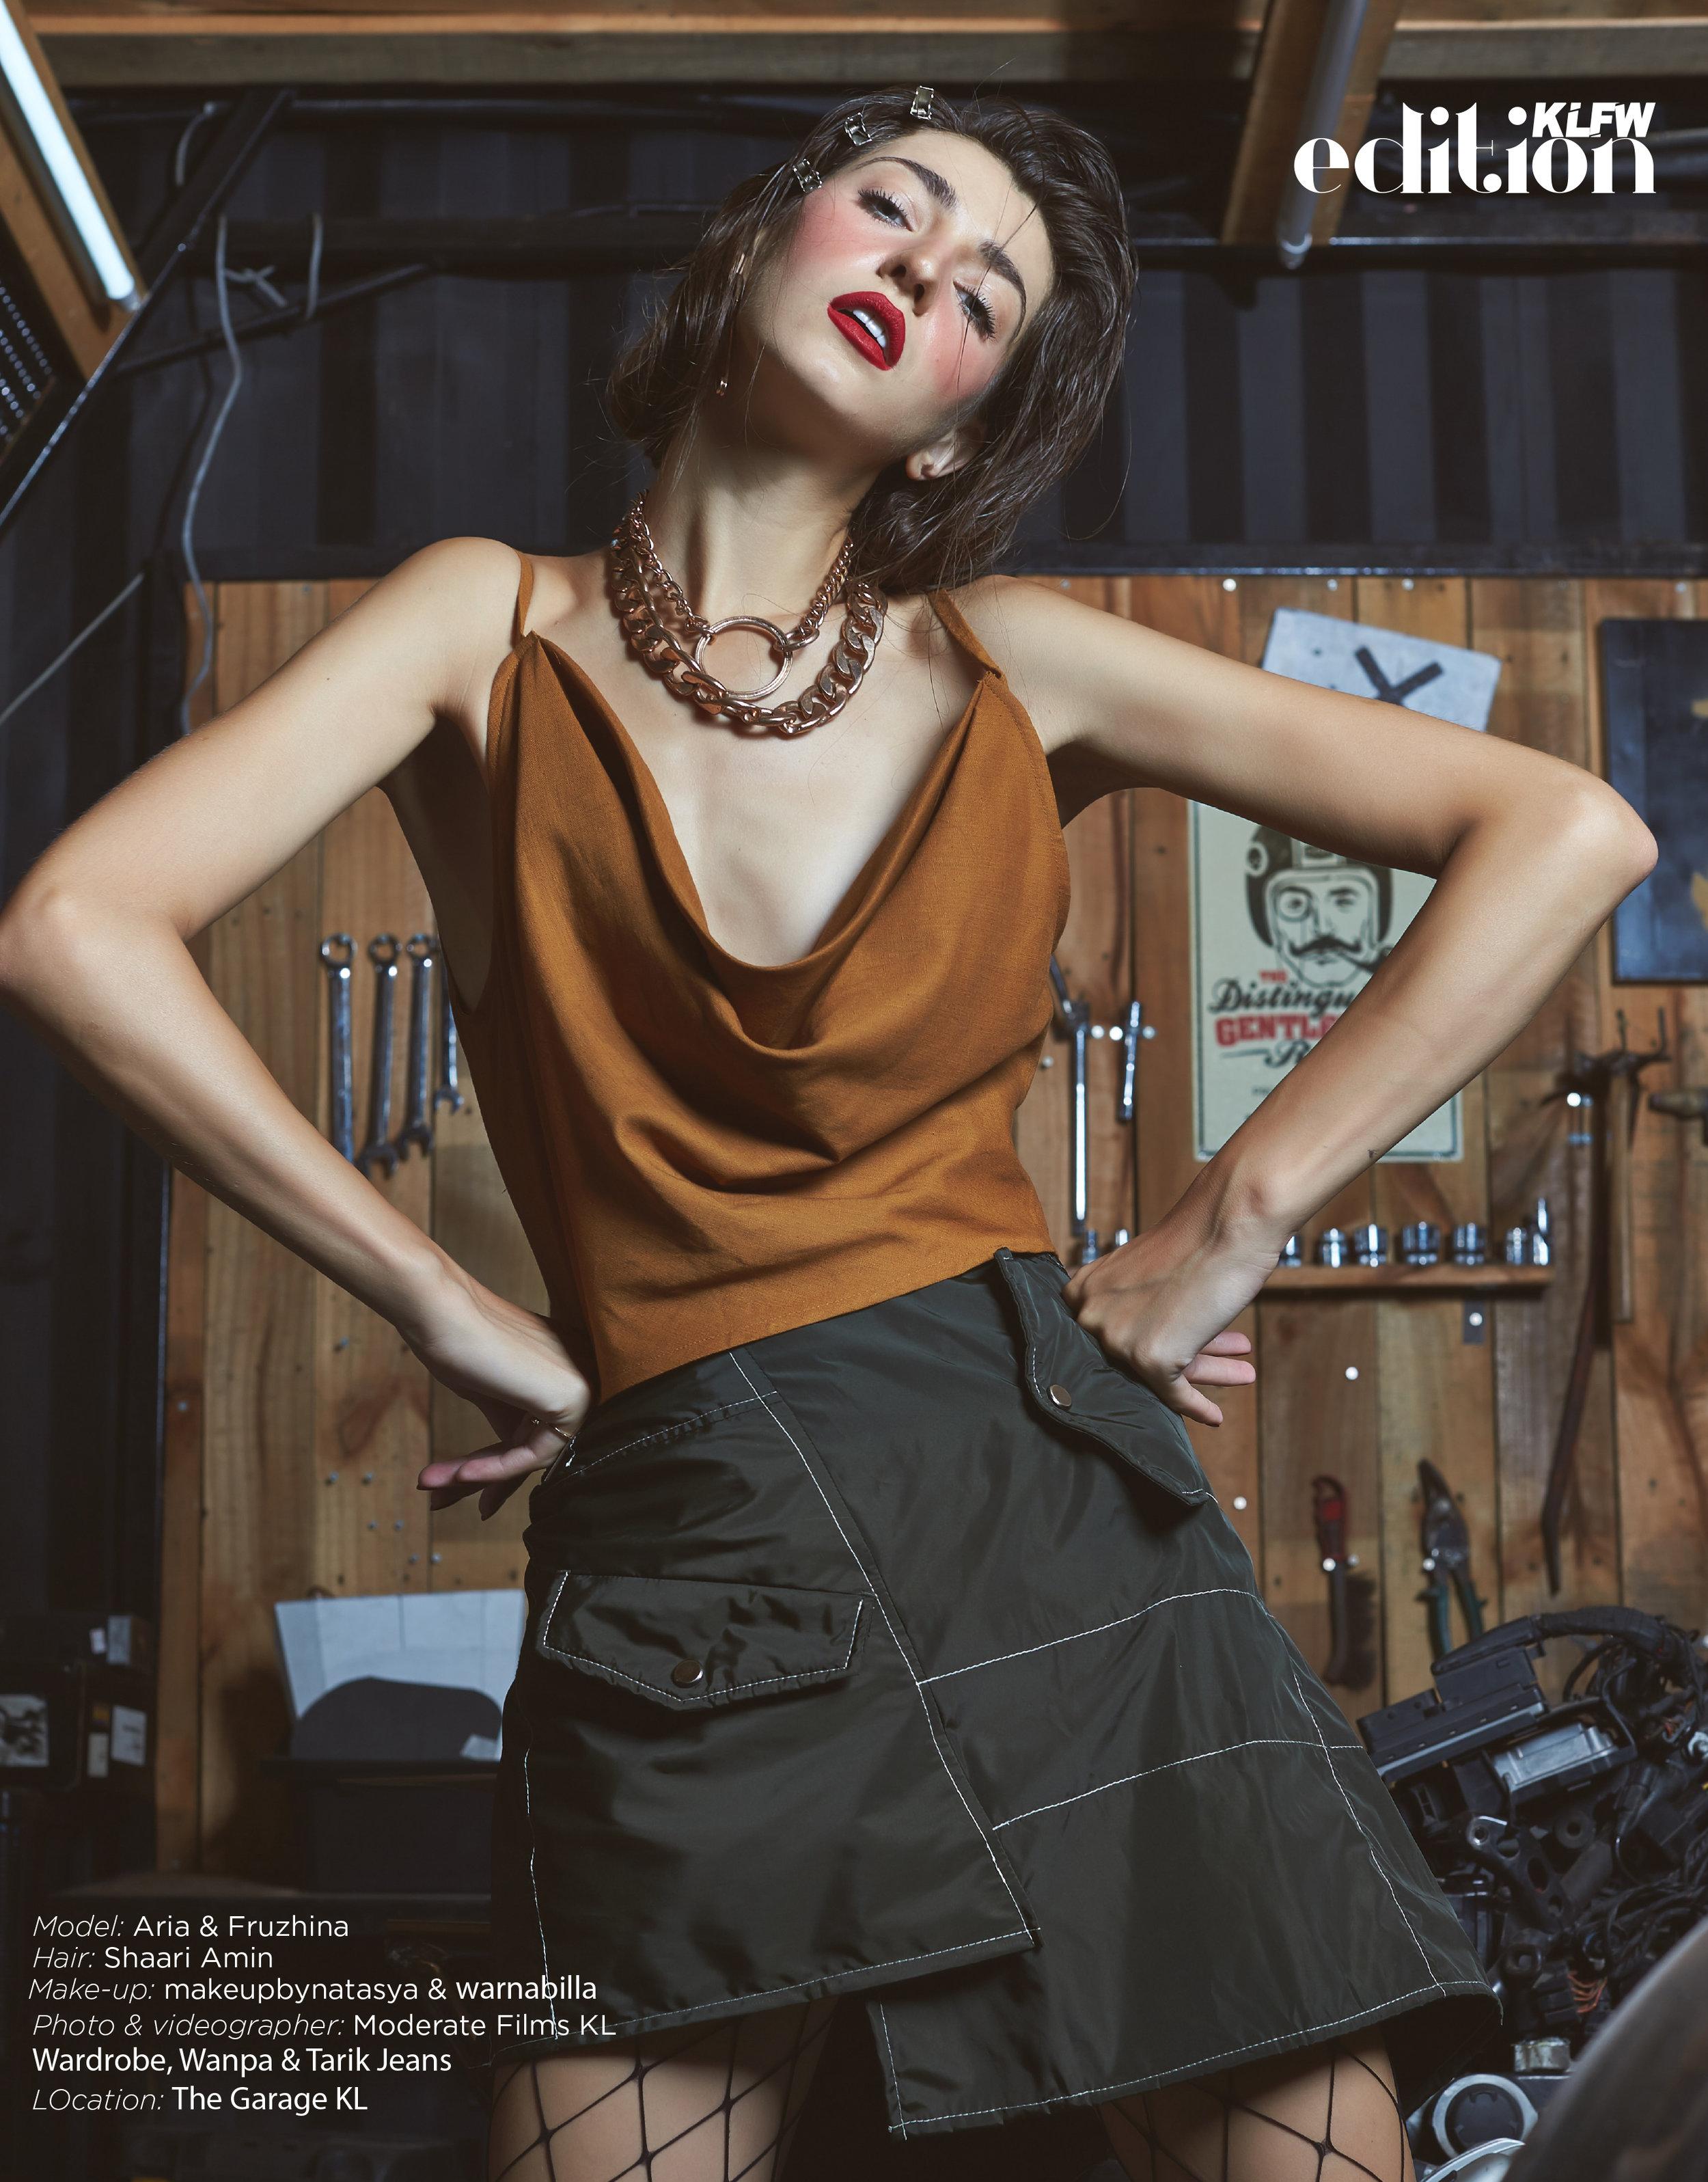 Models:  Aria  &  Fruzh i , Hair:  shaari_amin  , Makeup:  makeupbynatasya  &  warnabilla , Stylist:  nazlivingastyle  ,  Wardrobe ,  Wanpa  &  Tarik Jeans  Photo & Videographer:  Moderate Films KL , Location:  The Garage KL